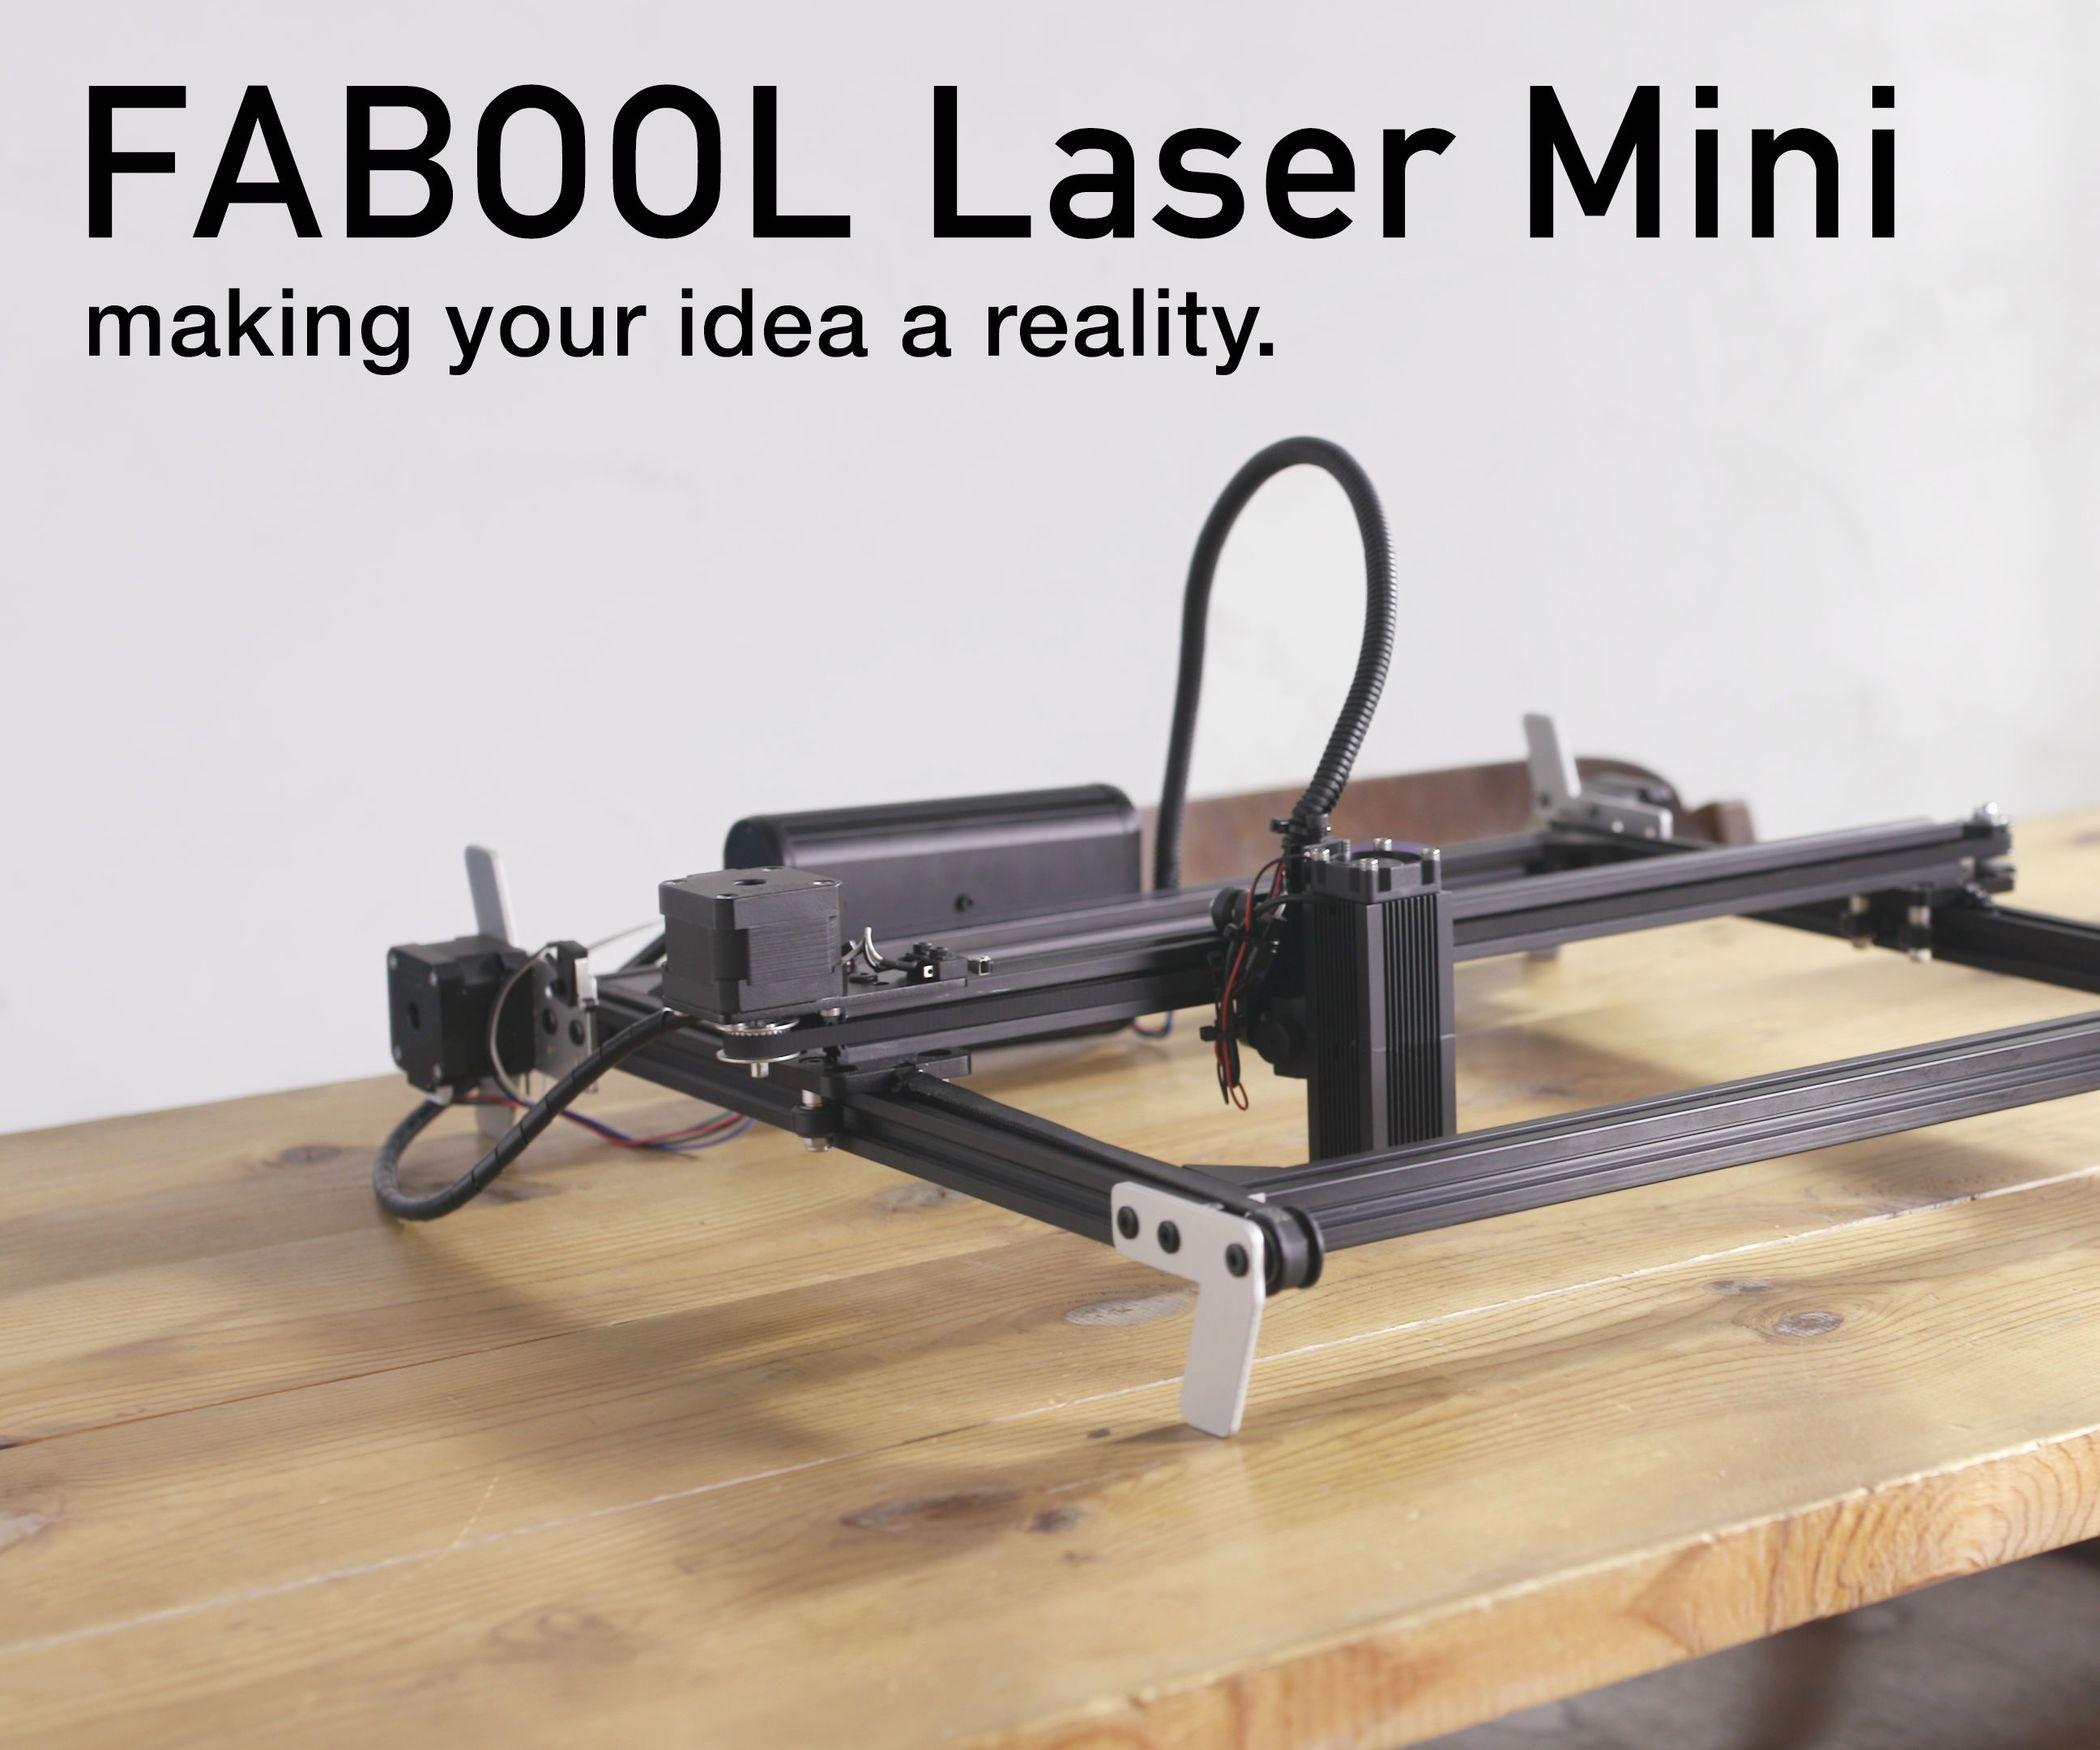 Diy Desktop Laser Cutter And Engraver Fabool Laser Mini Diy Laser Cutter Laser Cutter Diy Desktop